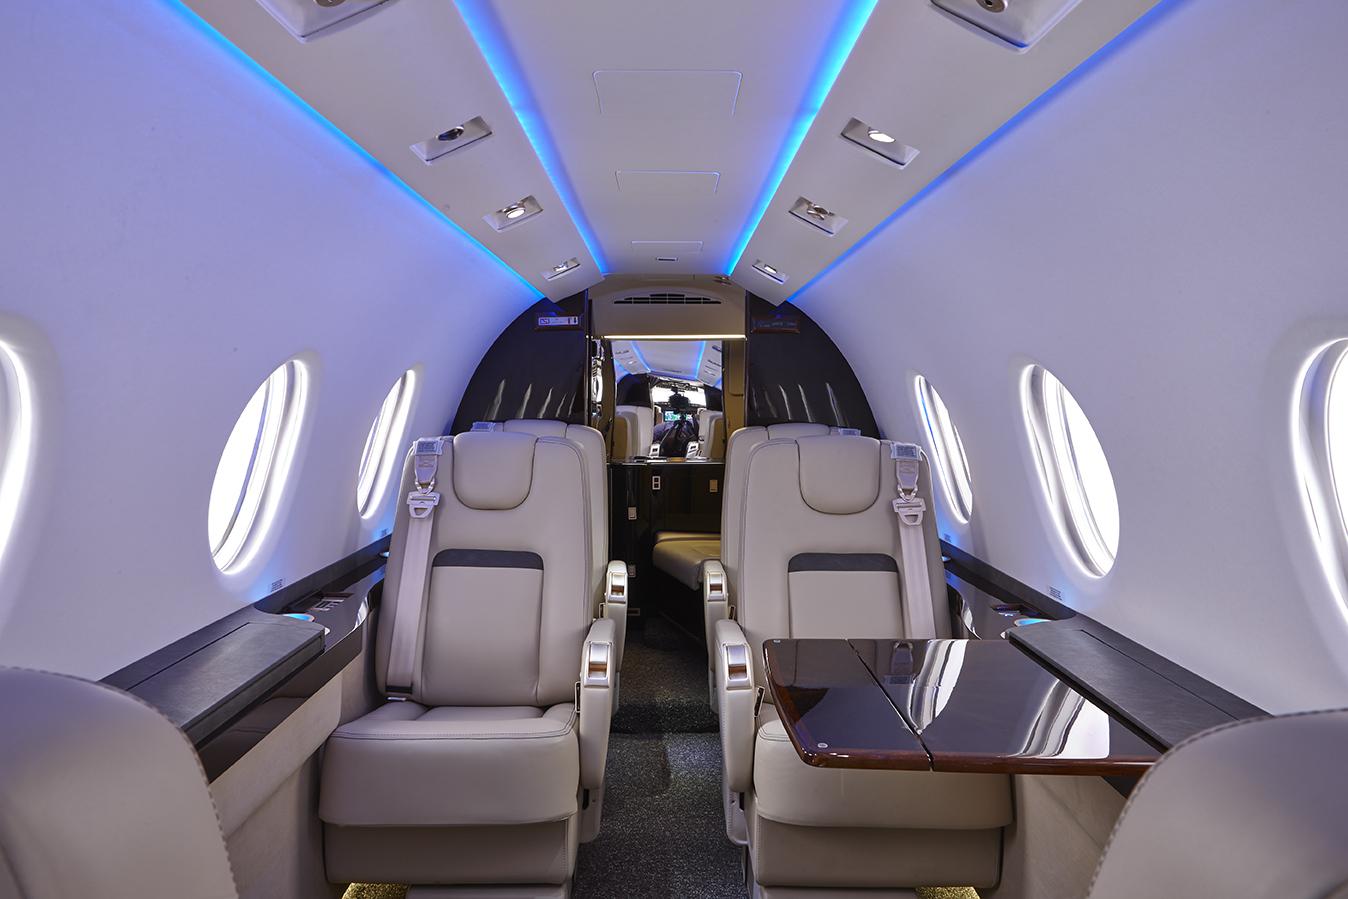 Hawker_400XP_Interior_Light-Jet_Legacy_Aviation_Private_Jet_NetJets_Jet_Charter_TEB_VNY_MIA_PBI_FRG_SFO_FLL_FXE_BED.jpg